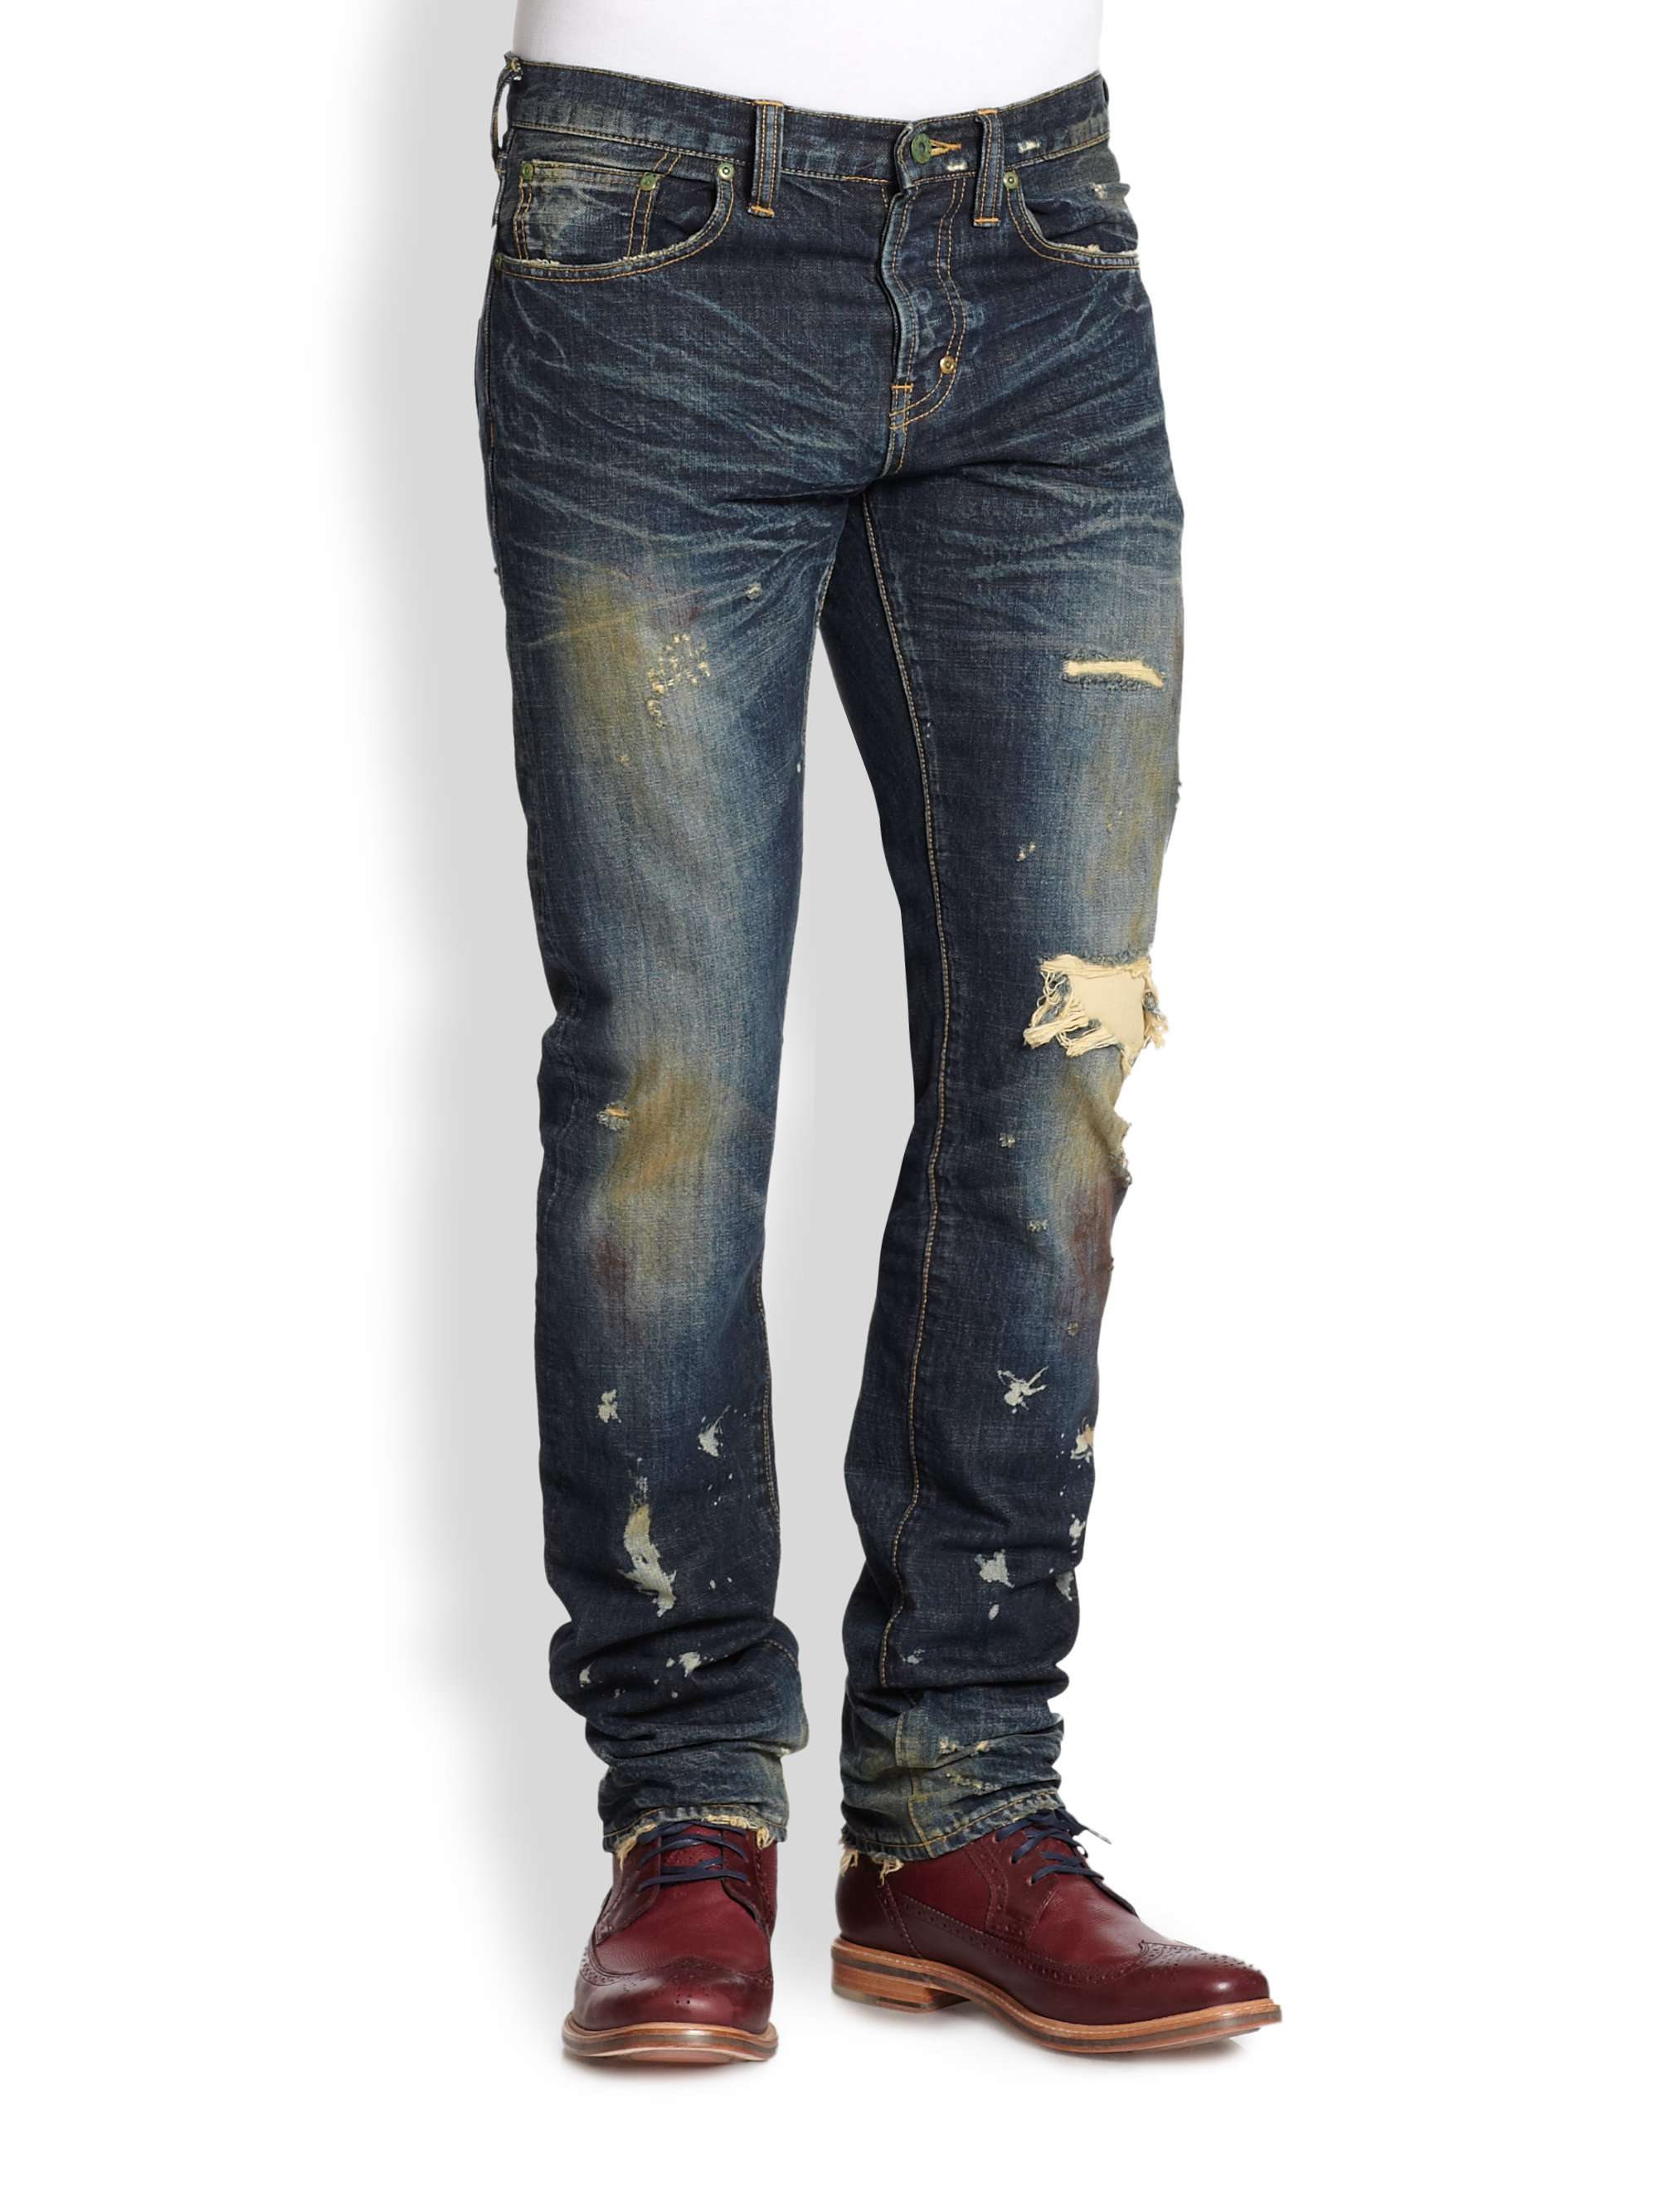 Skinny Leg Jeans Mens